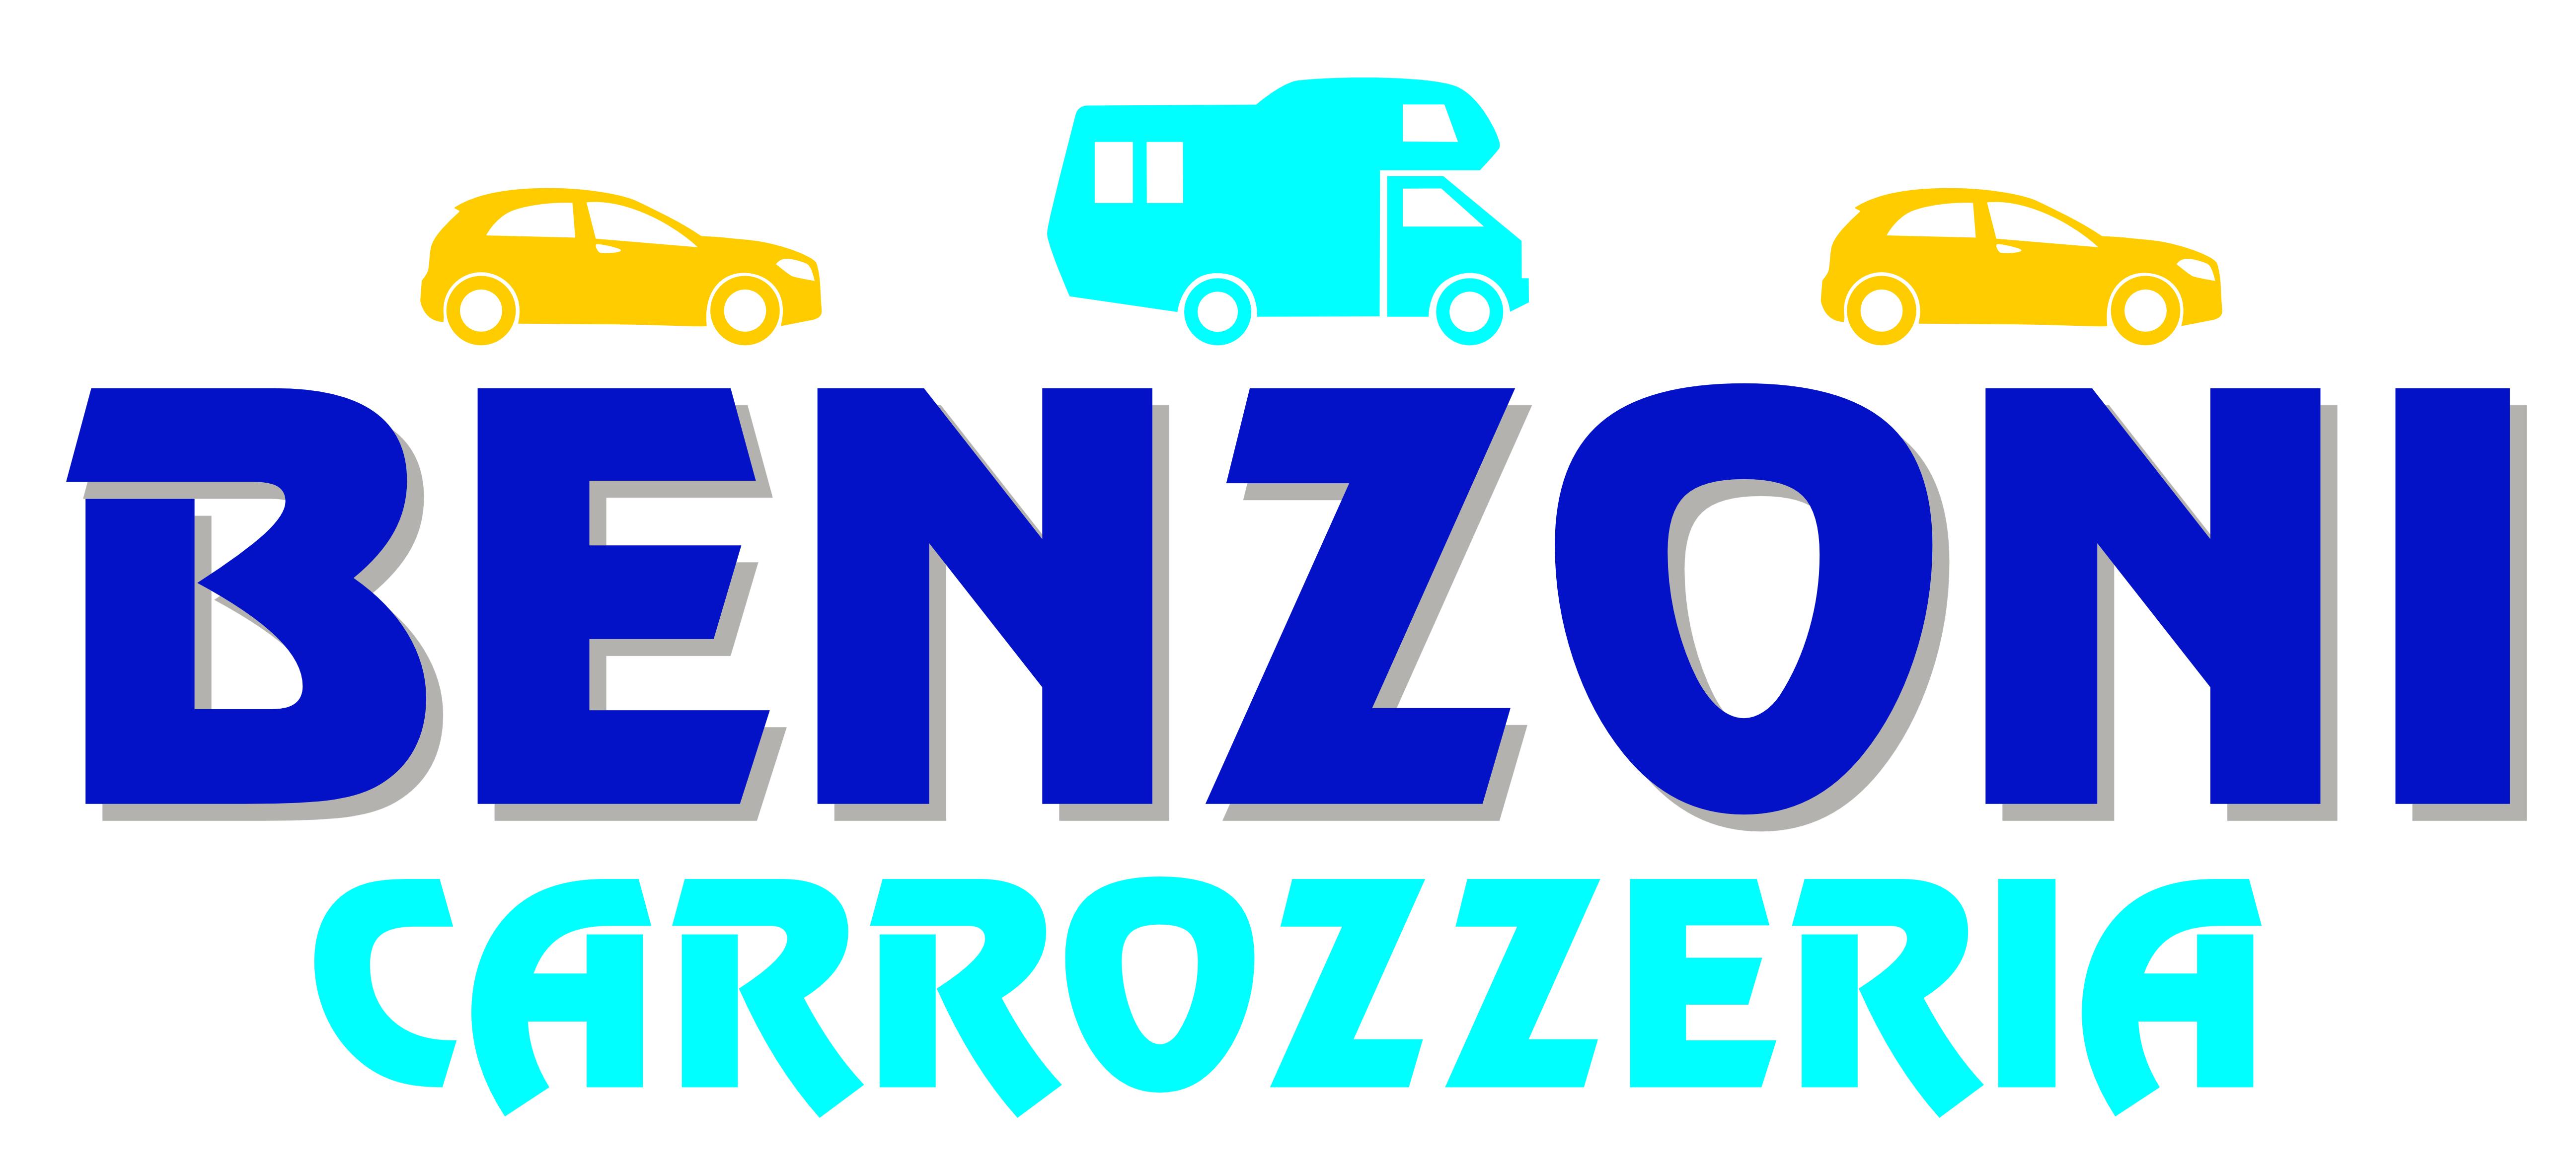 Benzoni Aldo